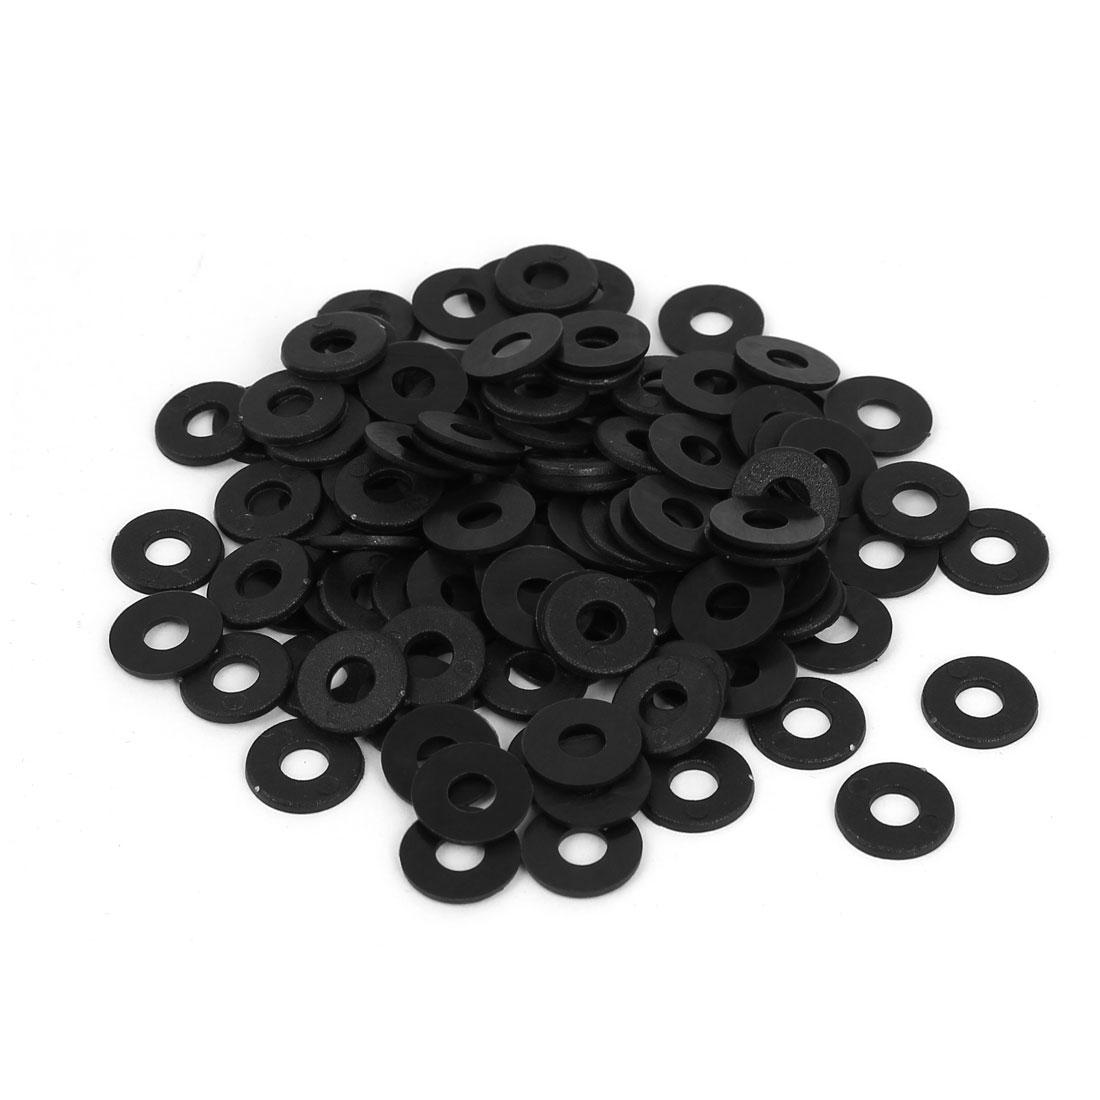 M4 x 10mm x 1mm Round Flat Nylon Shoulder Washer Gasket Seal Rings Black 100 Pcs